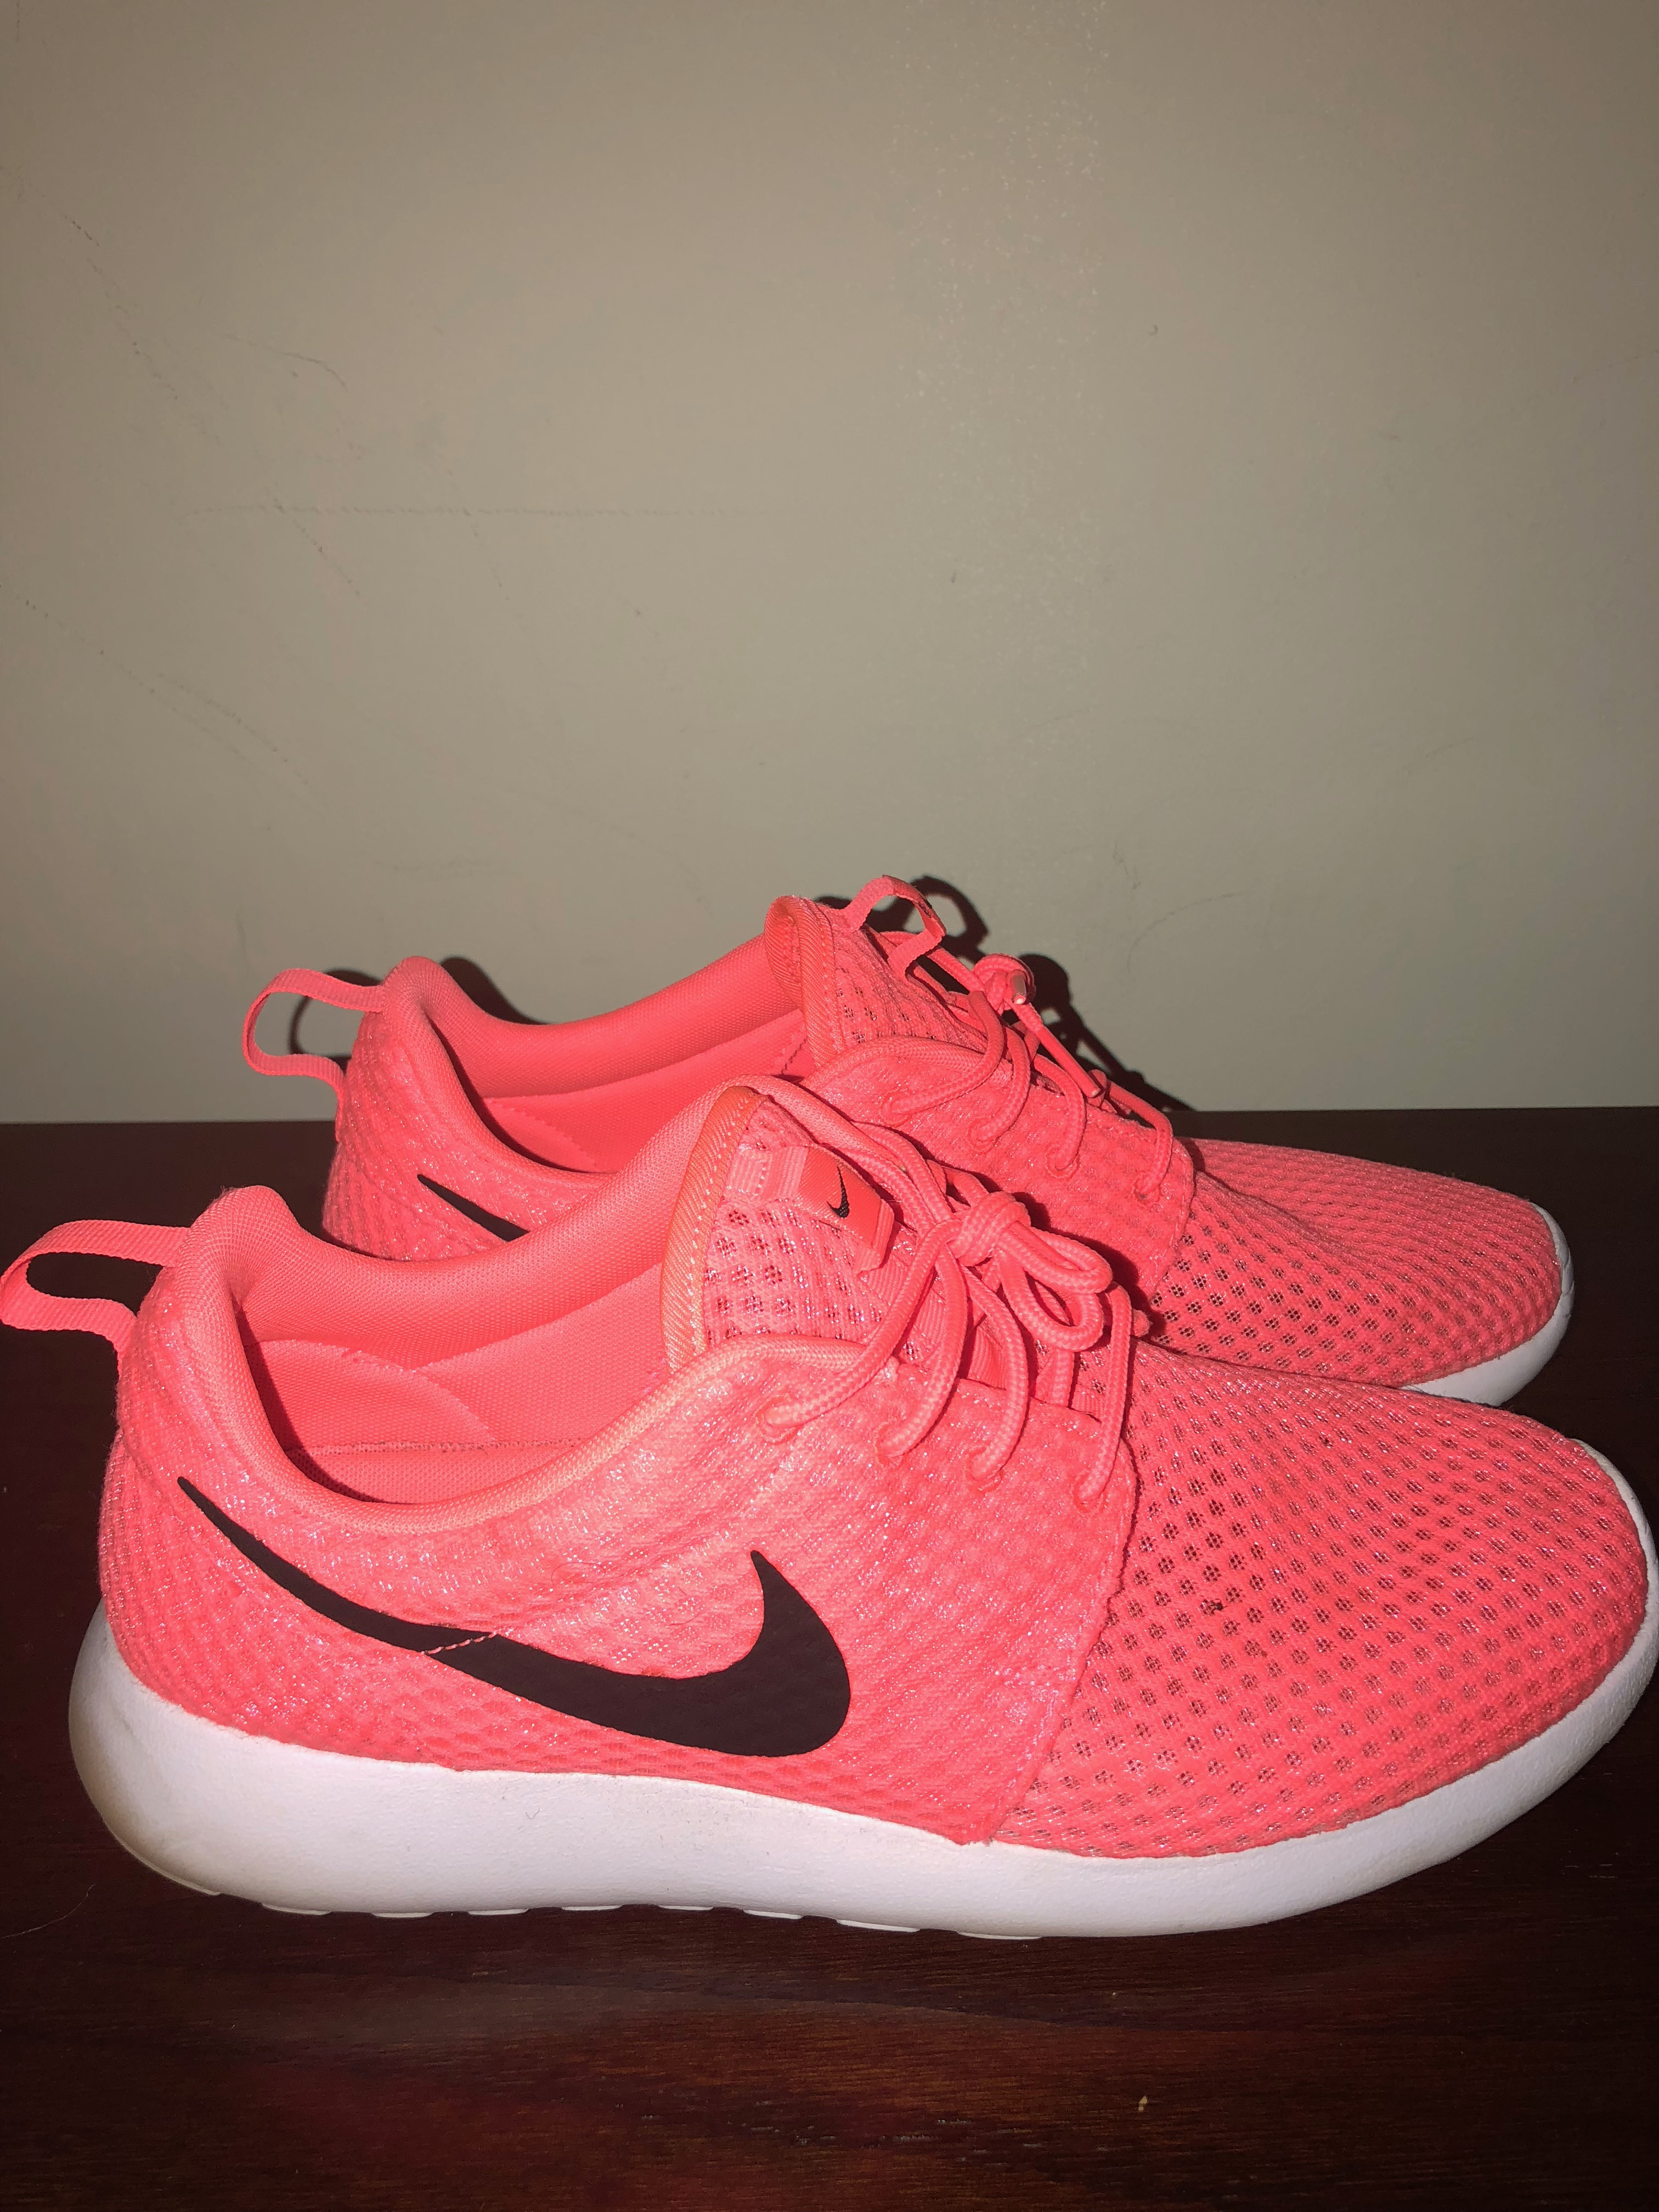 best service d346c d7388 Nike Nike Roshe Run One Mens Size 11 Mens Hot Lava pink   Grailed